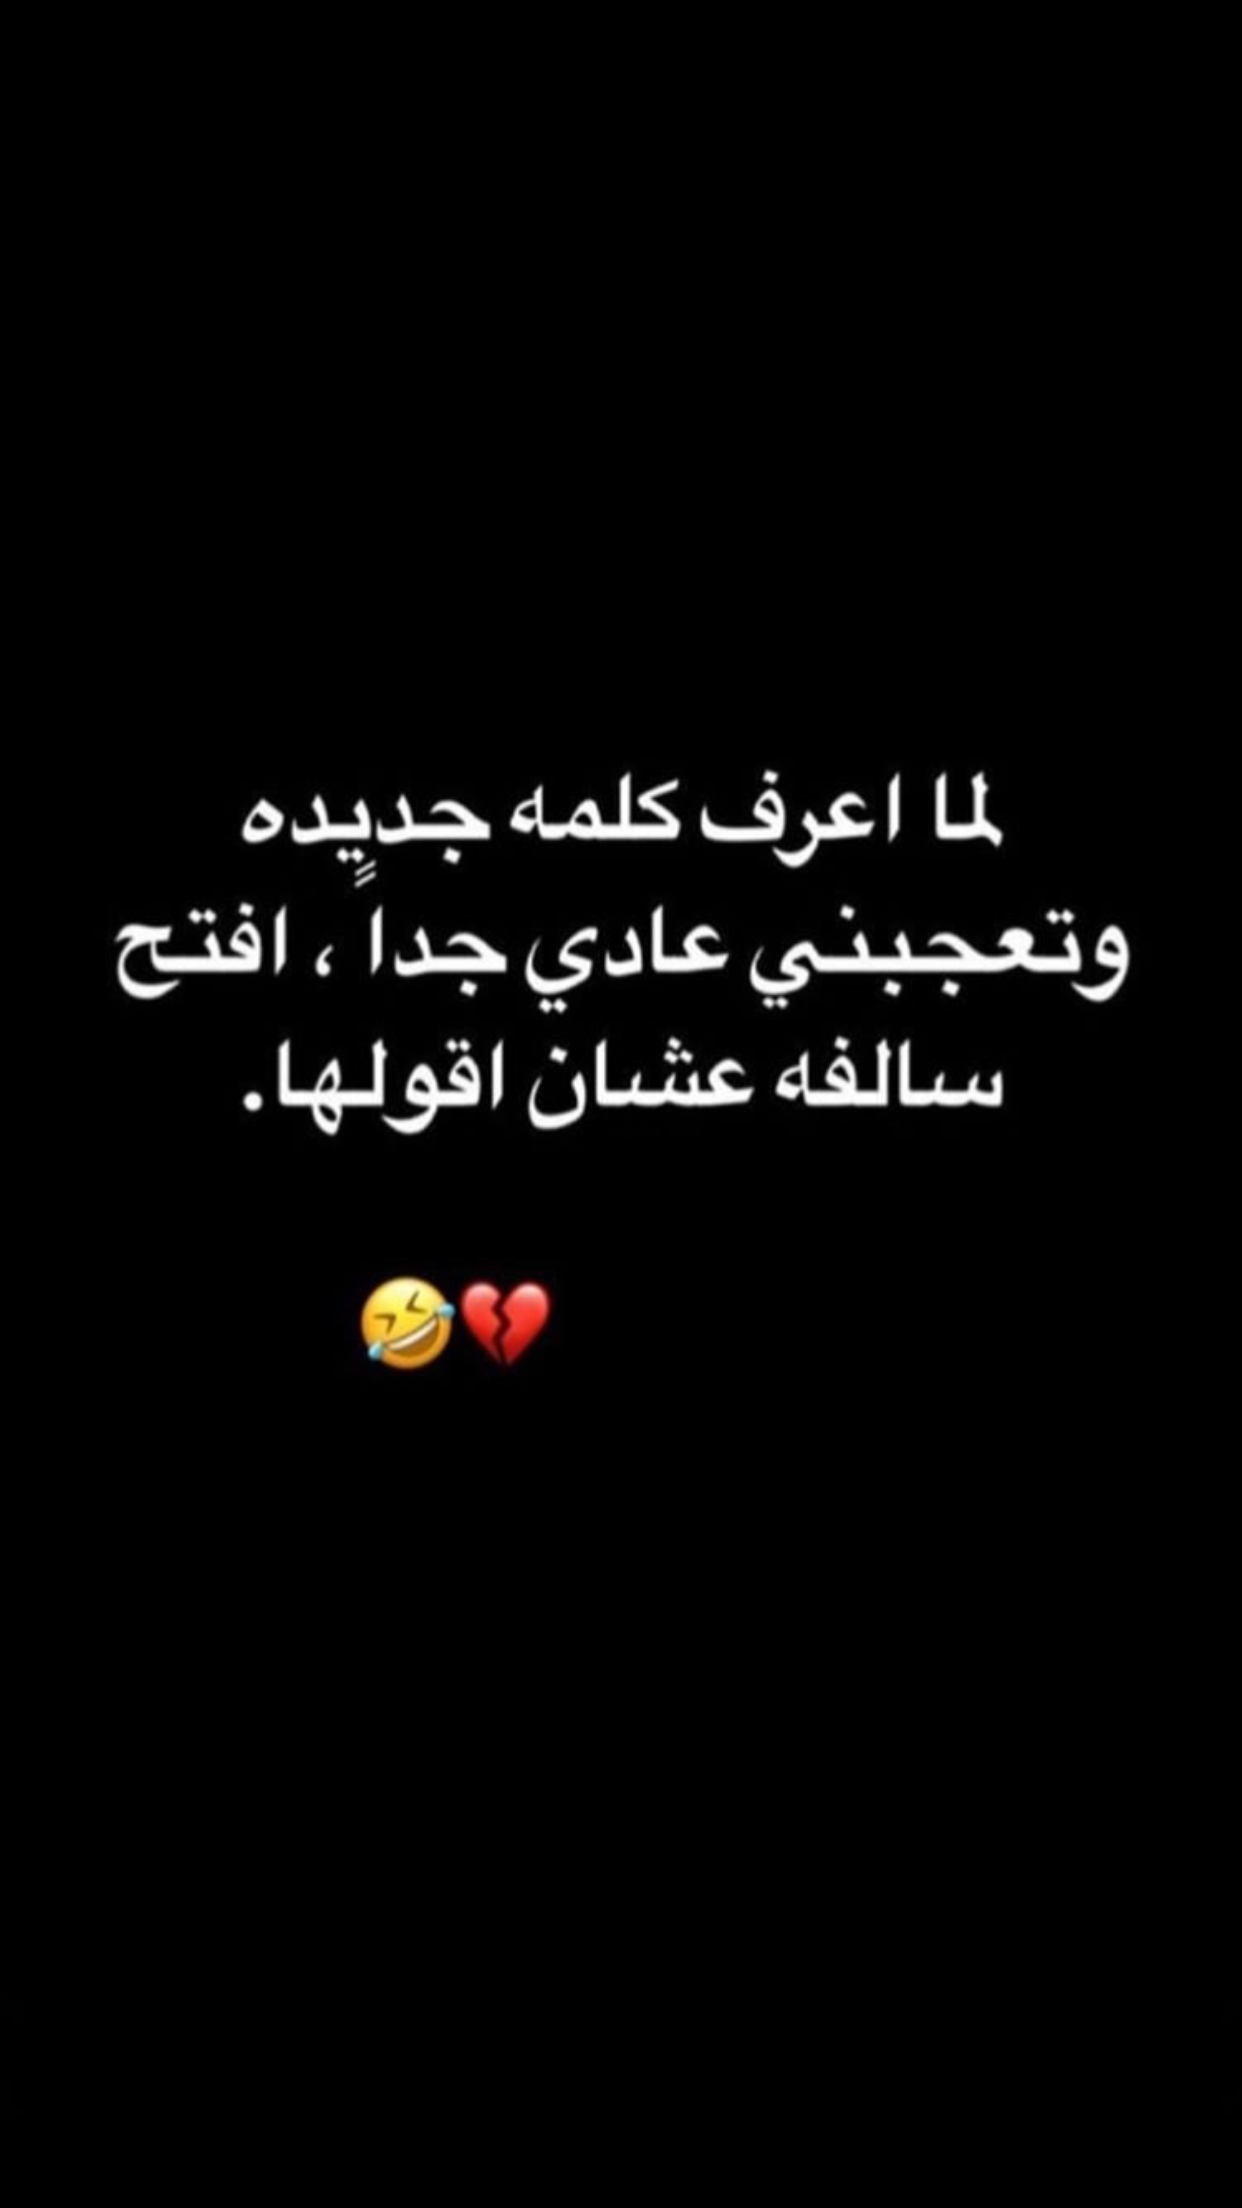 Pin By Sondos M S On فعاليات ميمز Jokes Quotes Funny Joke Quote Funny Arabic Quotes